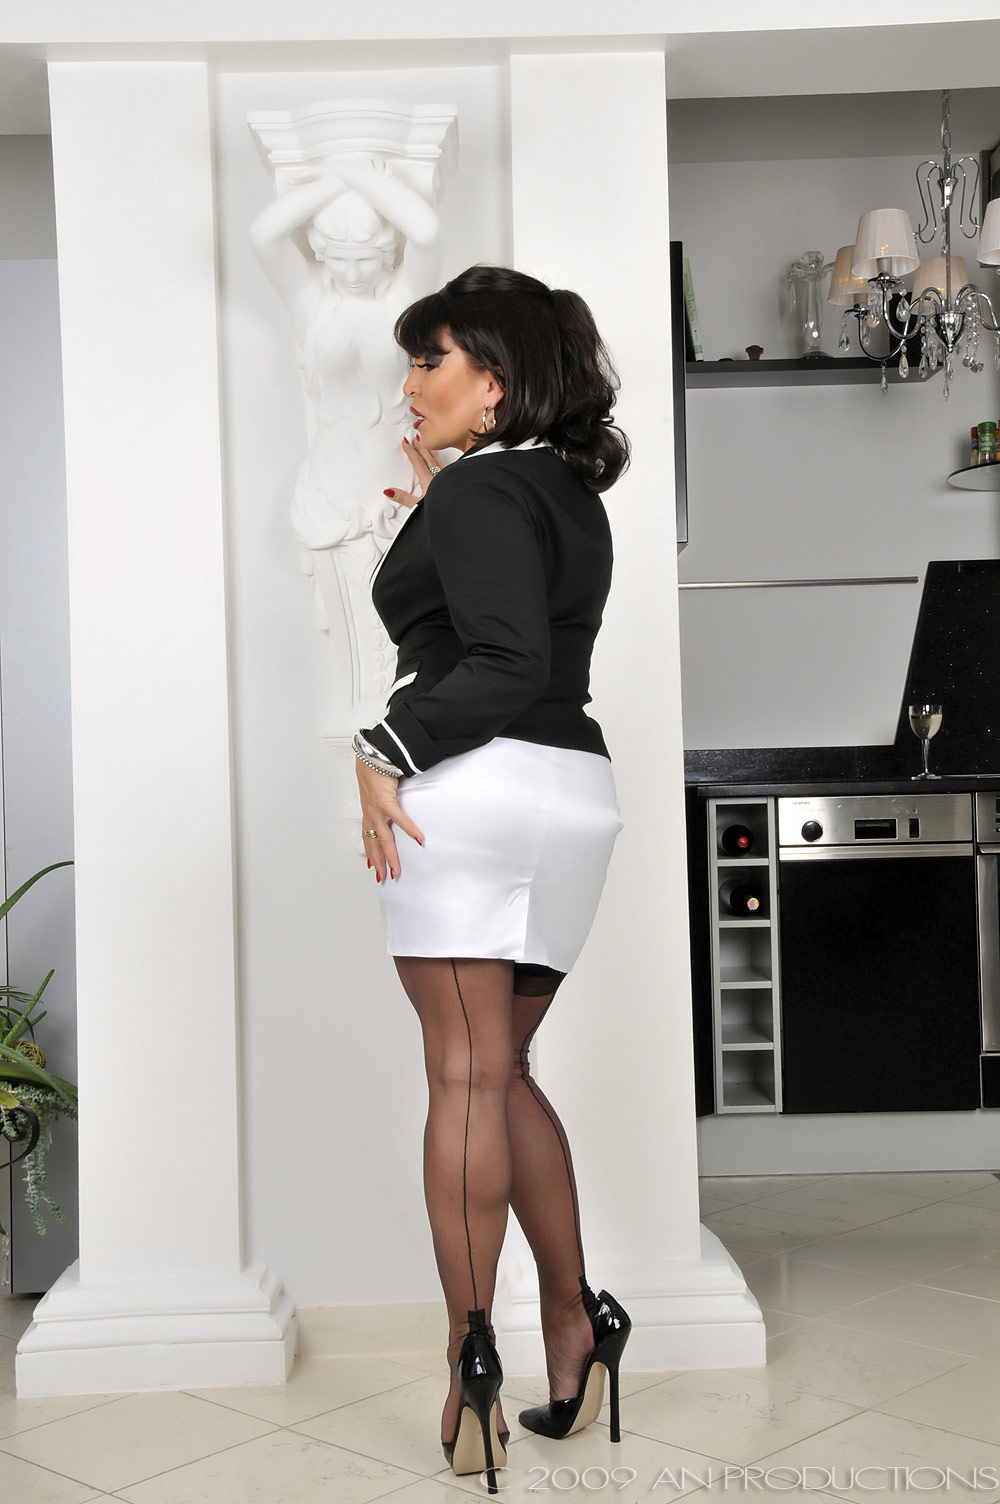 German Nylon Lady Amanda Teasing In Black Seamed Stockings Sey